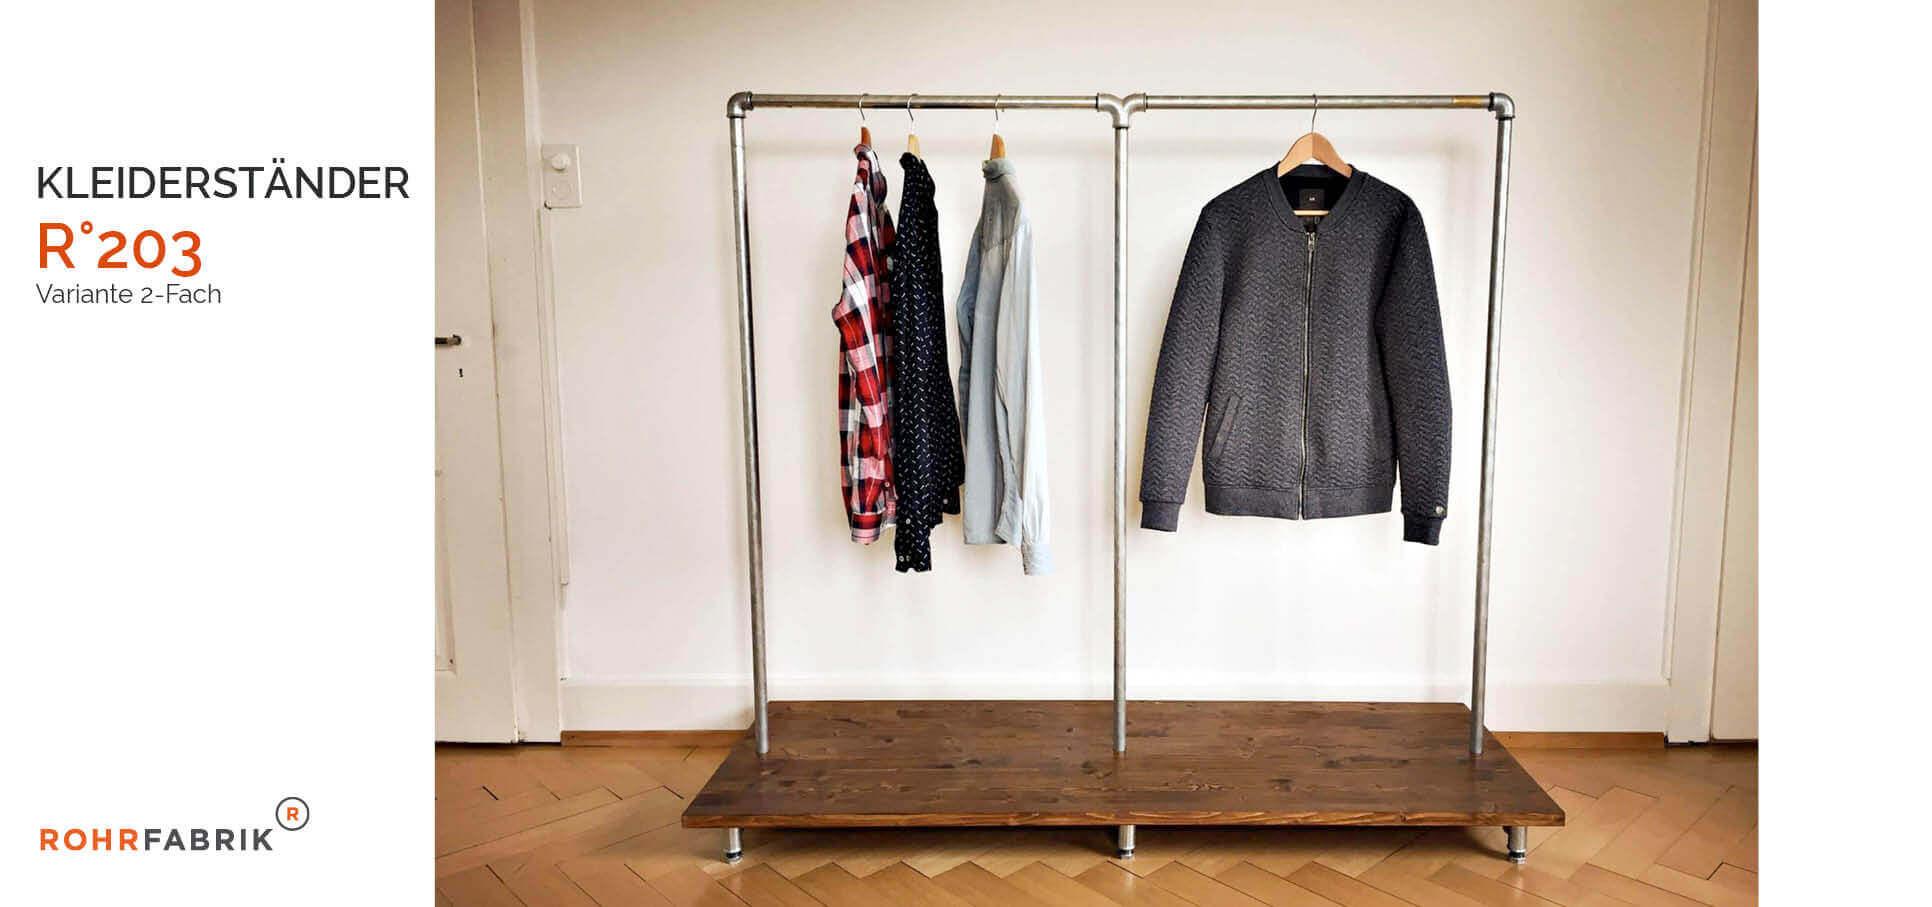 rohrfabrik-kleiderstaender-rohr-moebel-accessoire-design-interieur-ladenbau-garderobe-R203.jpg